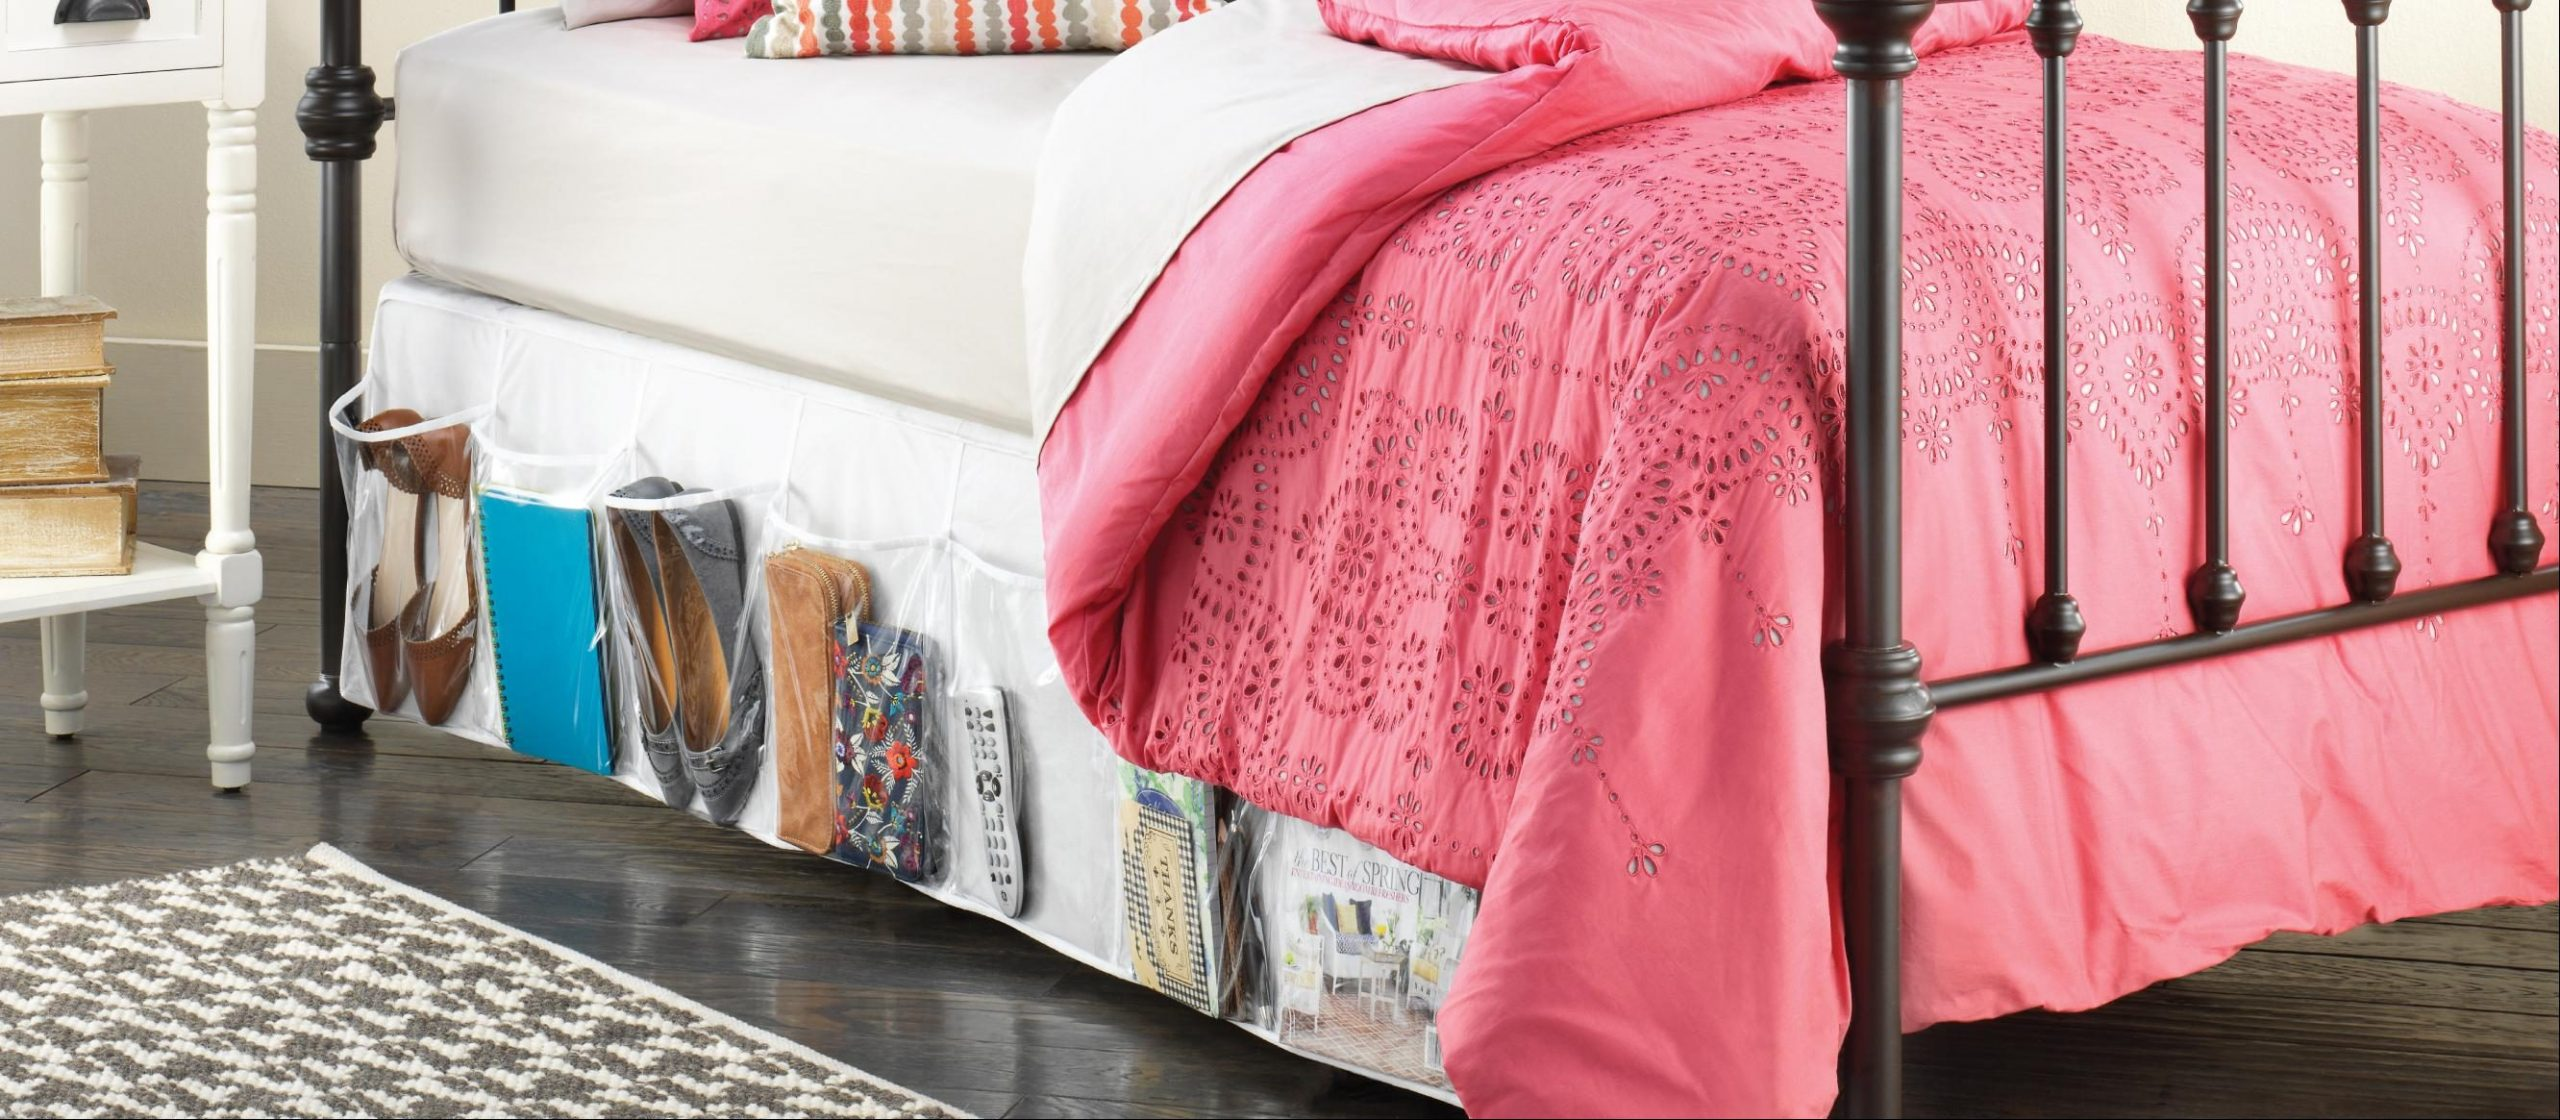 RV shoe storage idea: Whitmor 16-Pocket Bedskirt Storage Organizer, Clear, One Size Fits All Beds